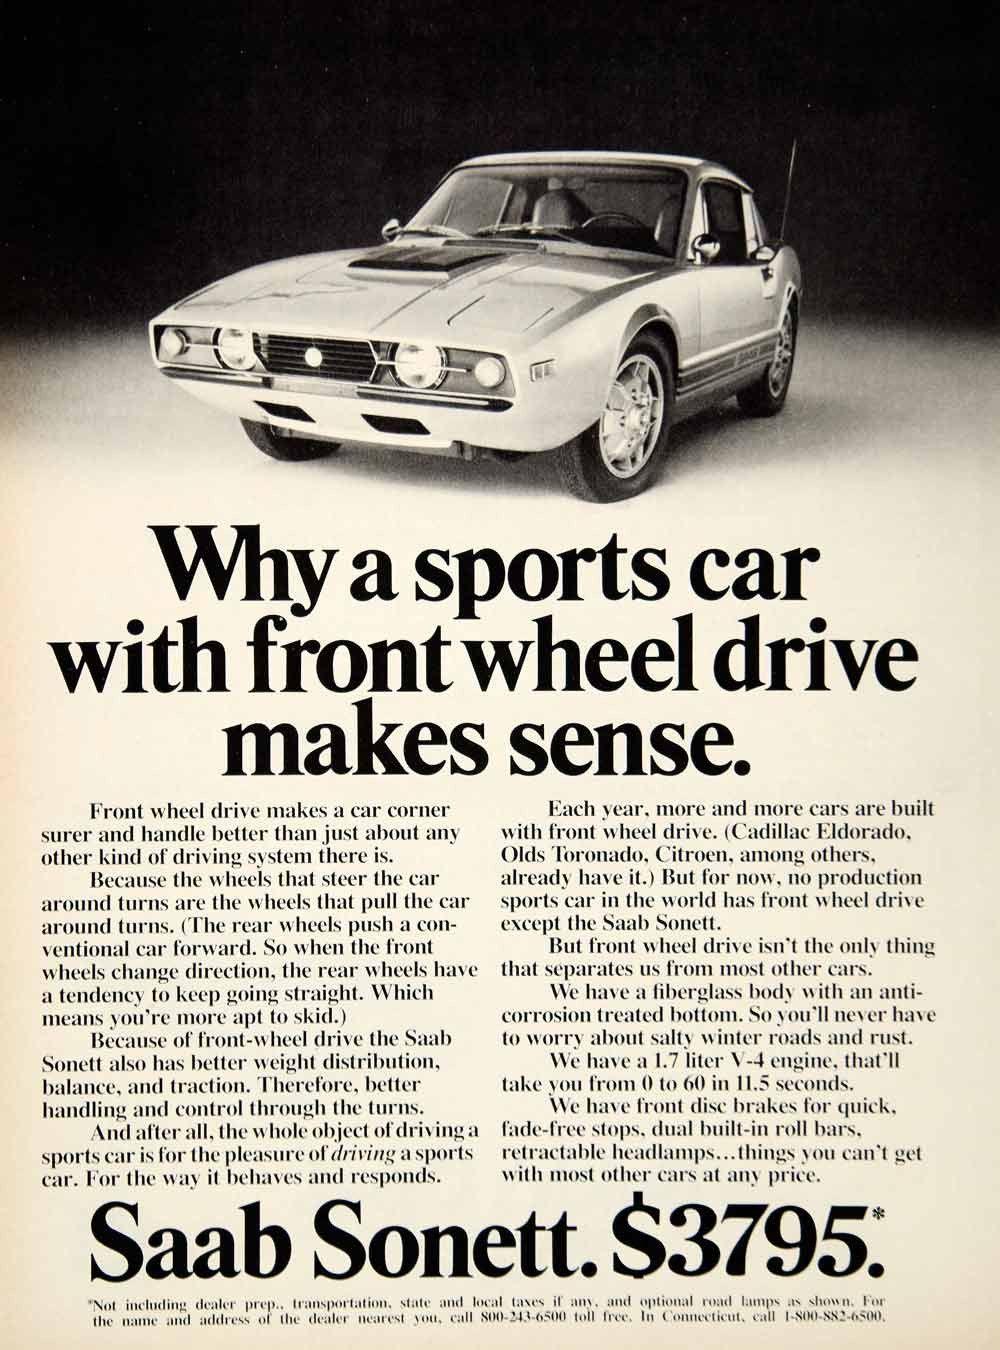 1972 Ad Saab Sonett Iii 2 Door Coupe Sports Car Clic Automobile Europe Ycd8